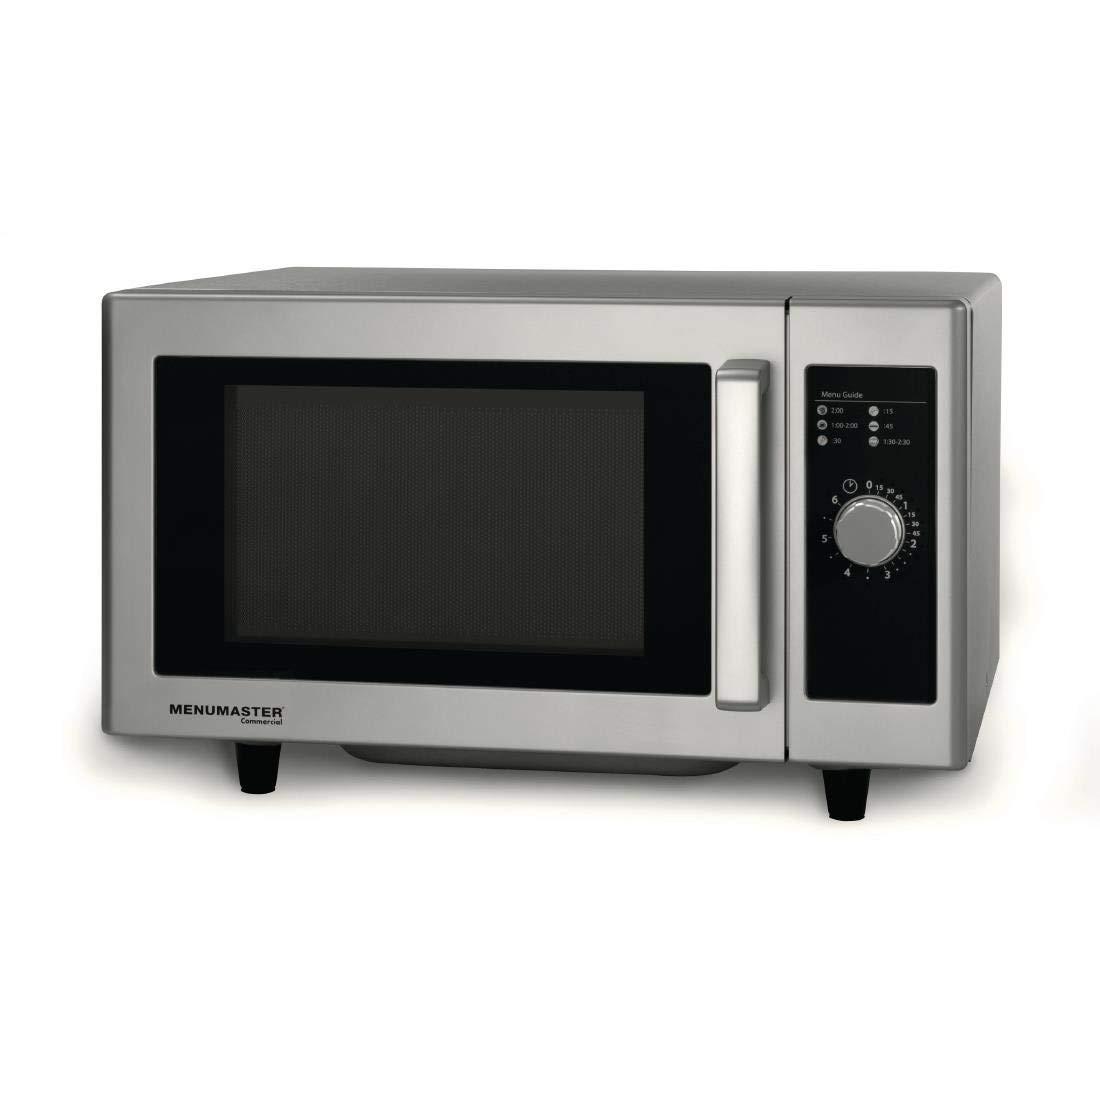 menumaster rms510ds kommerzielleres Microondas, 1000 W